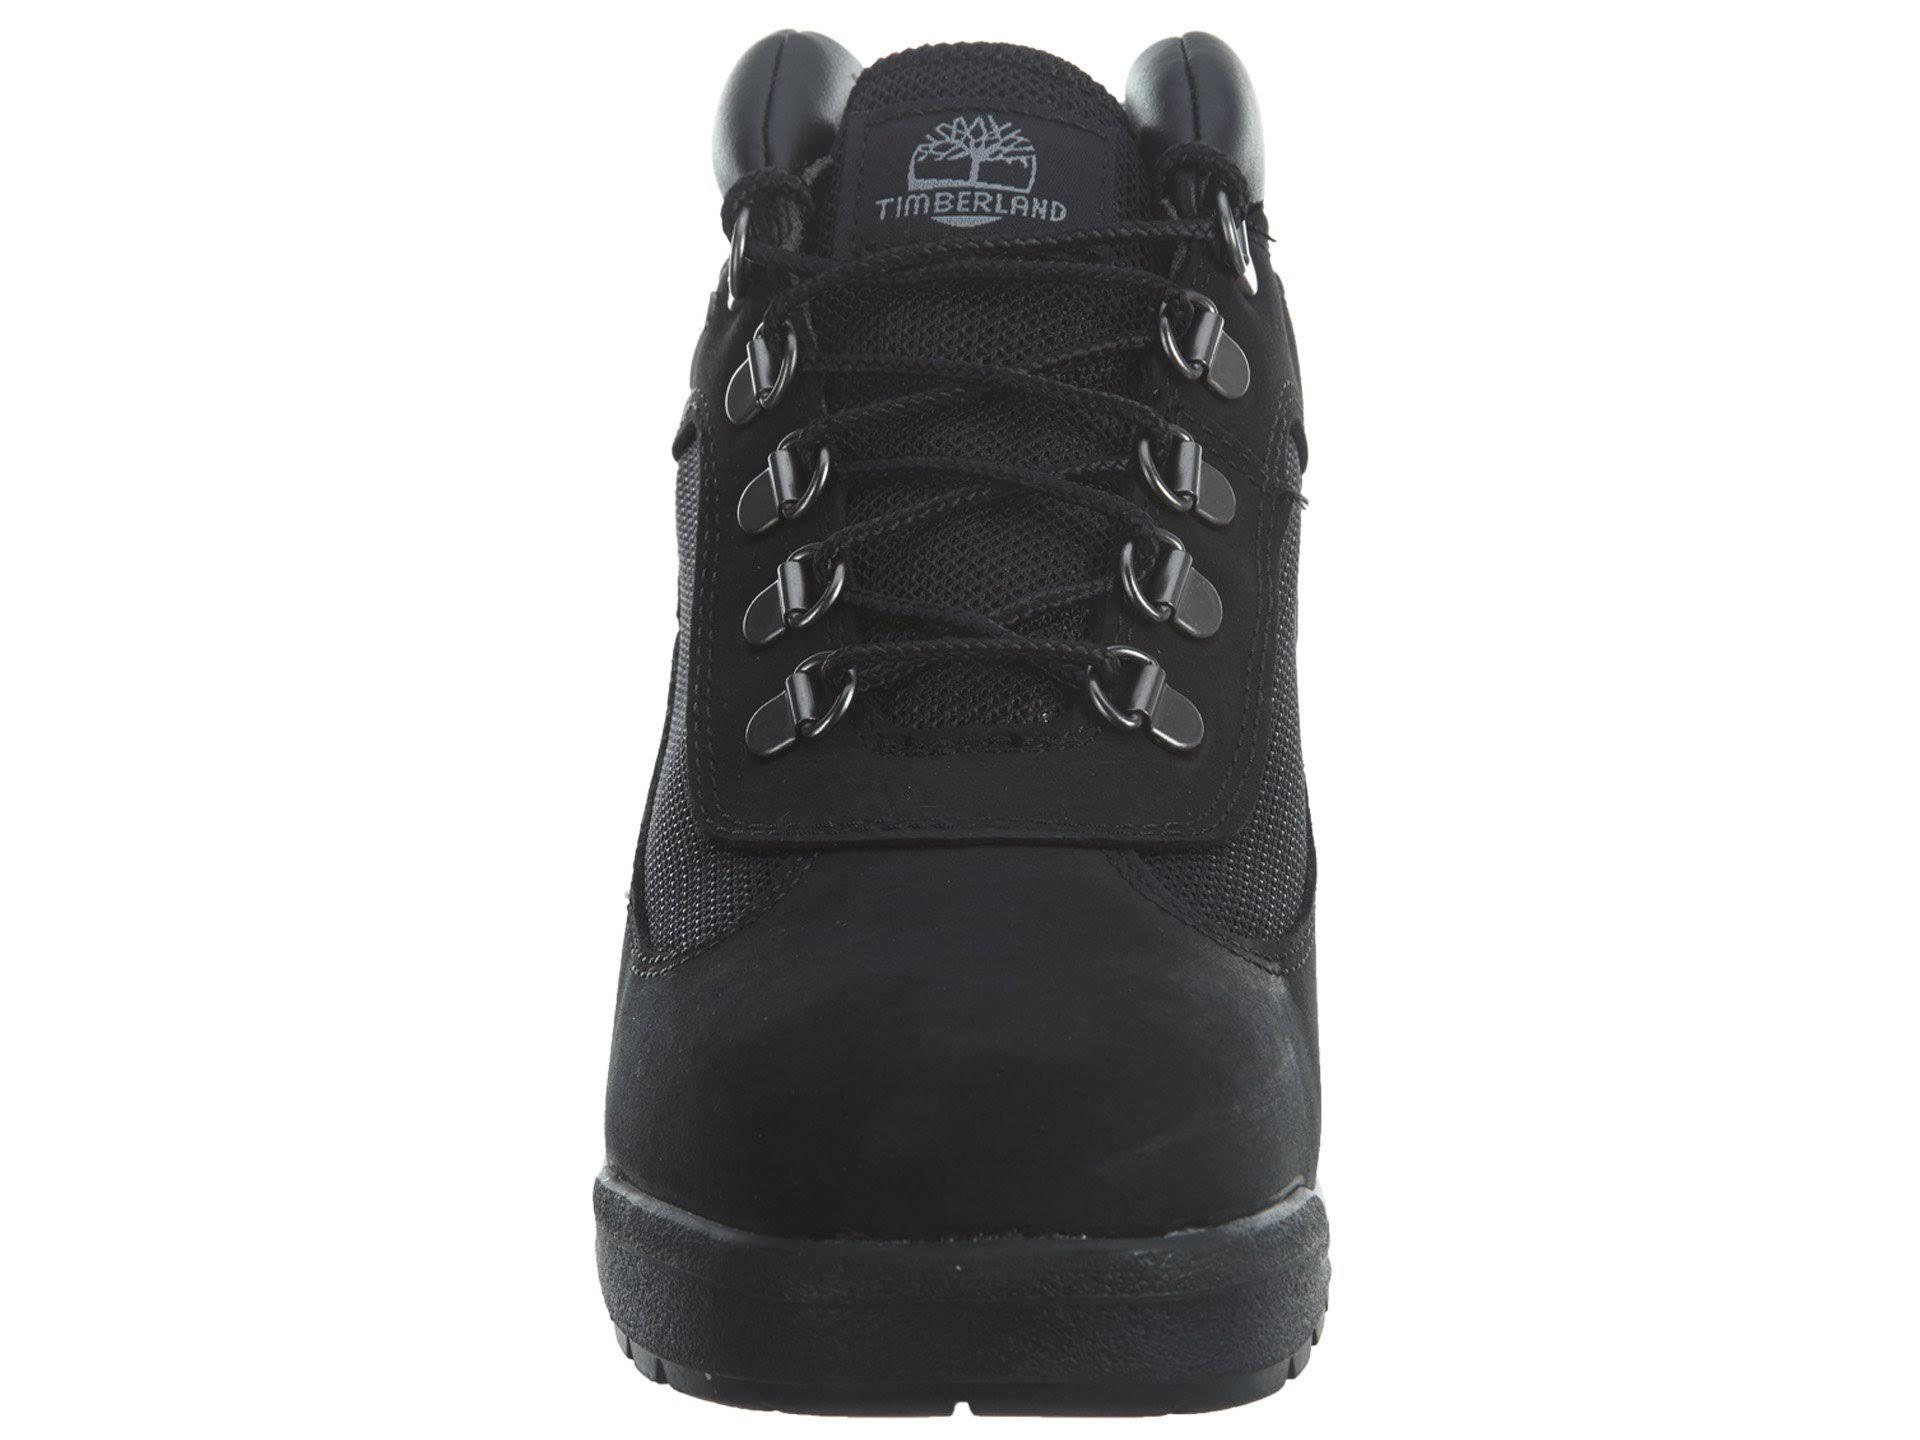 Field School Tamaño Nubuck Grade Boot Negro Mid Tb0a1acd001 Timberland Boys 5 qR4aqd